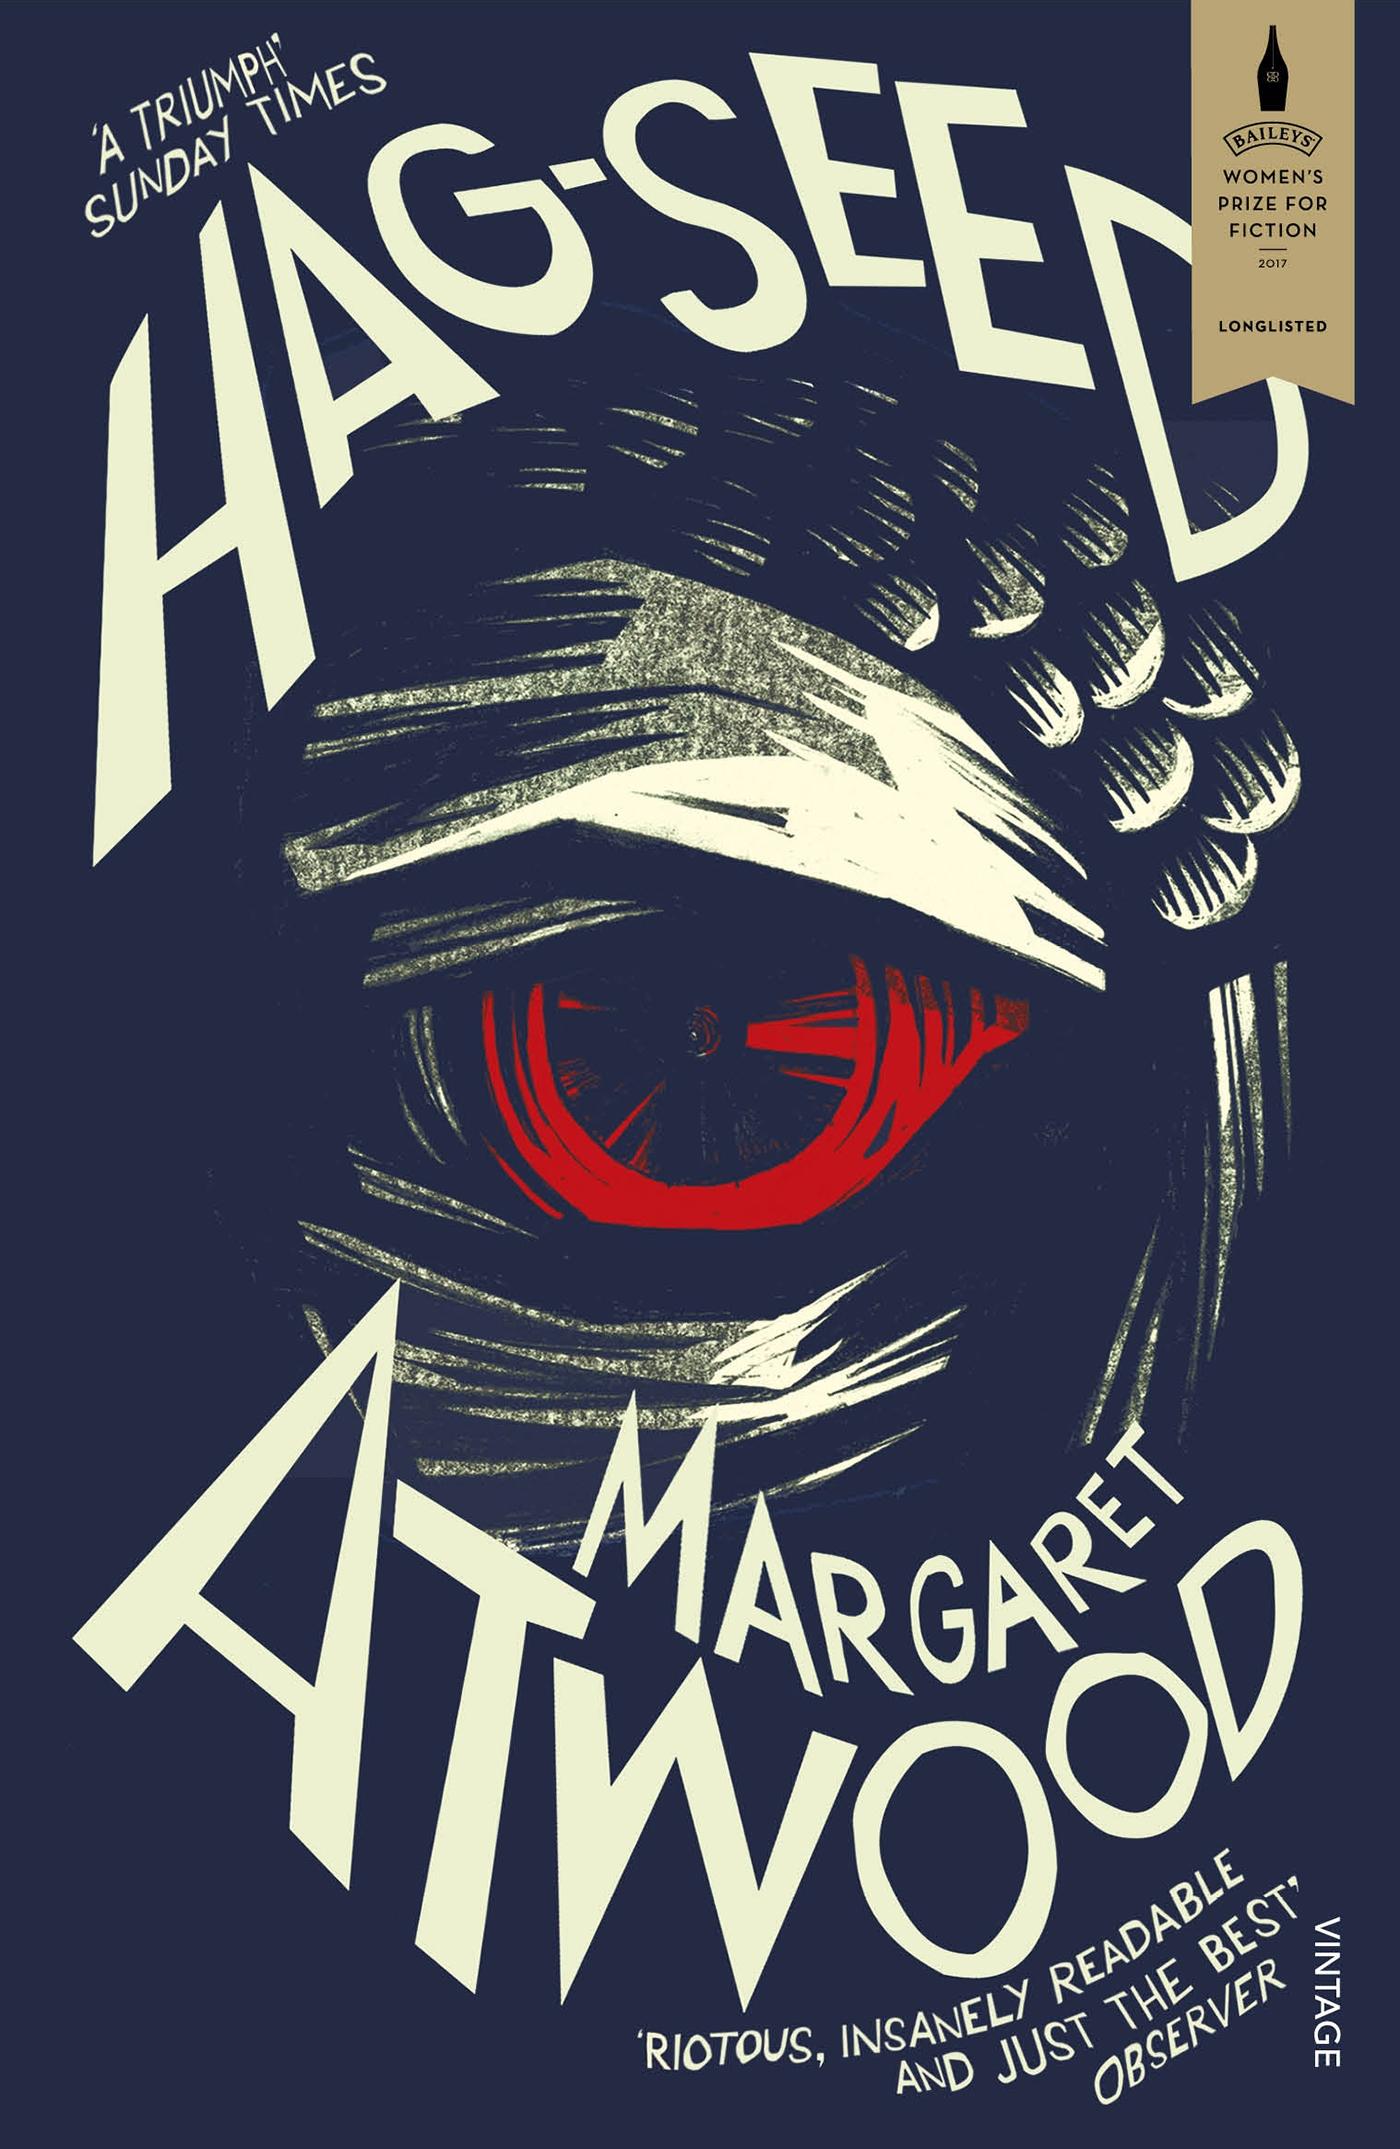 Hag-Seed by Margaret Atwood - Penguin Books Australia